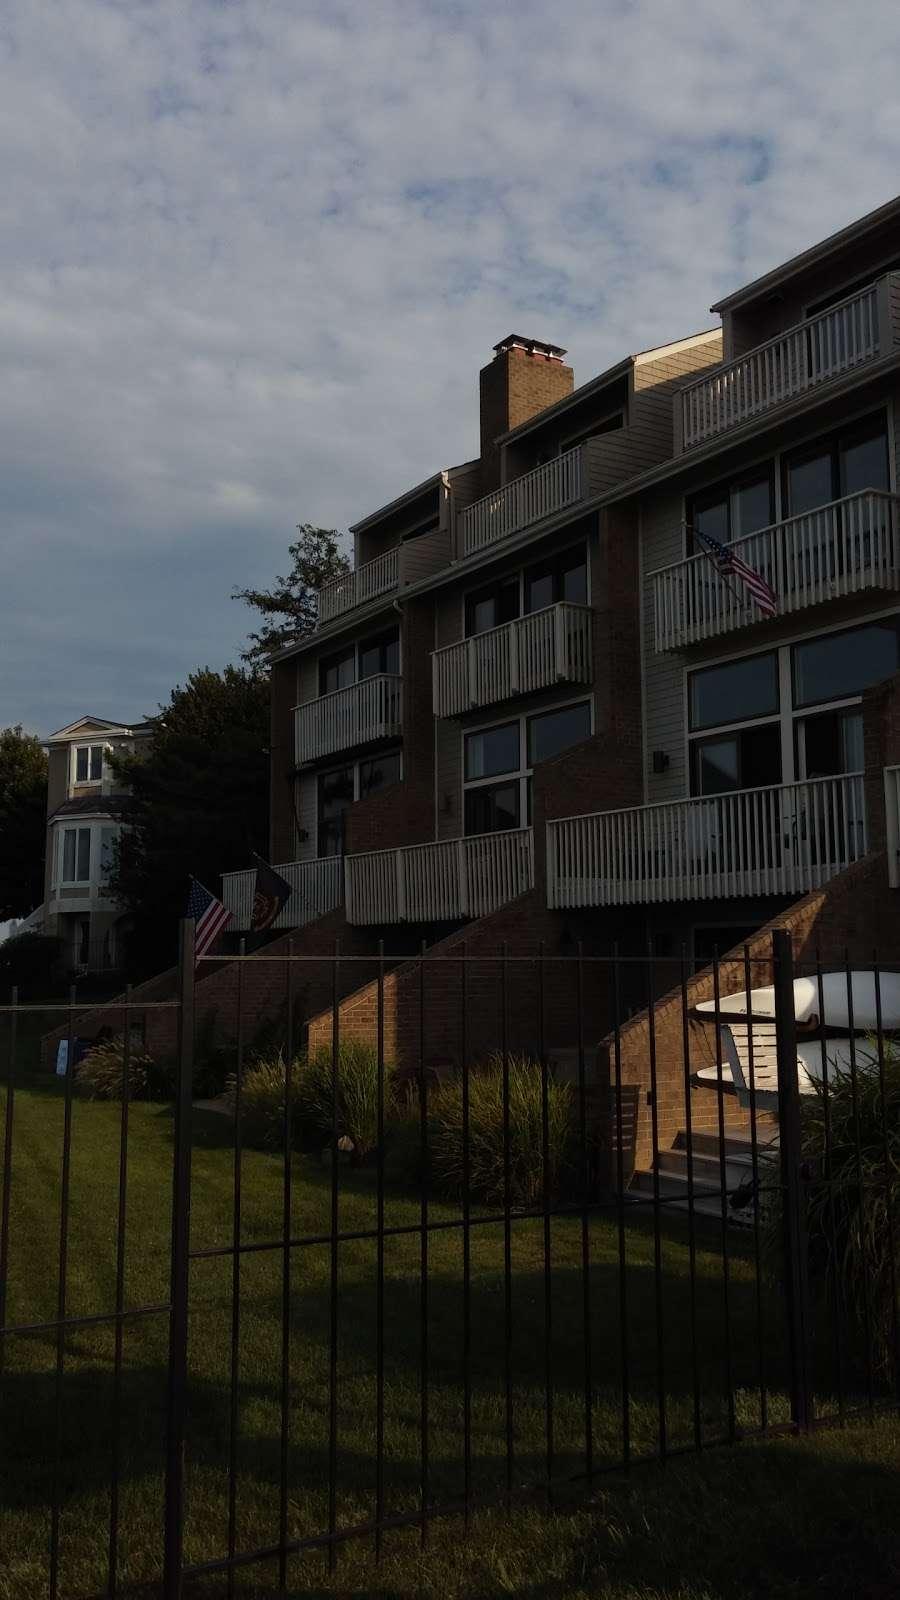 Horn Point Park - park  | Photo 8 of 10 | Address: Chesapeake Landing, Annapolis, MD 21403, USA